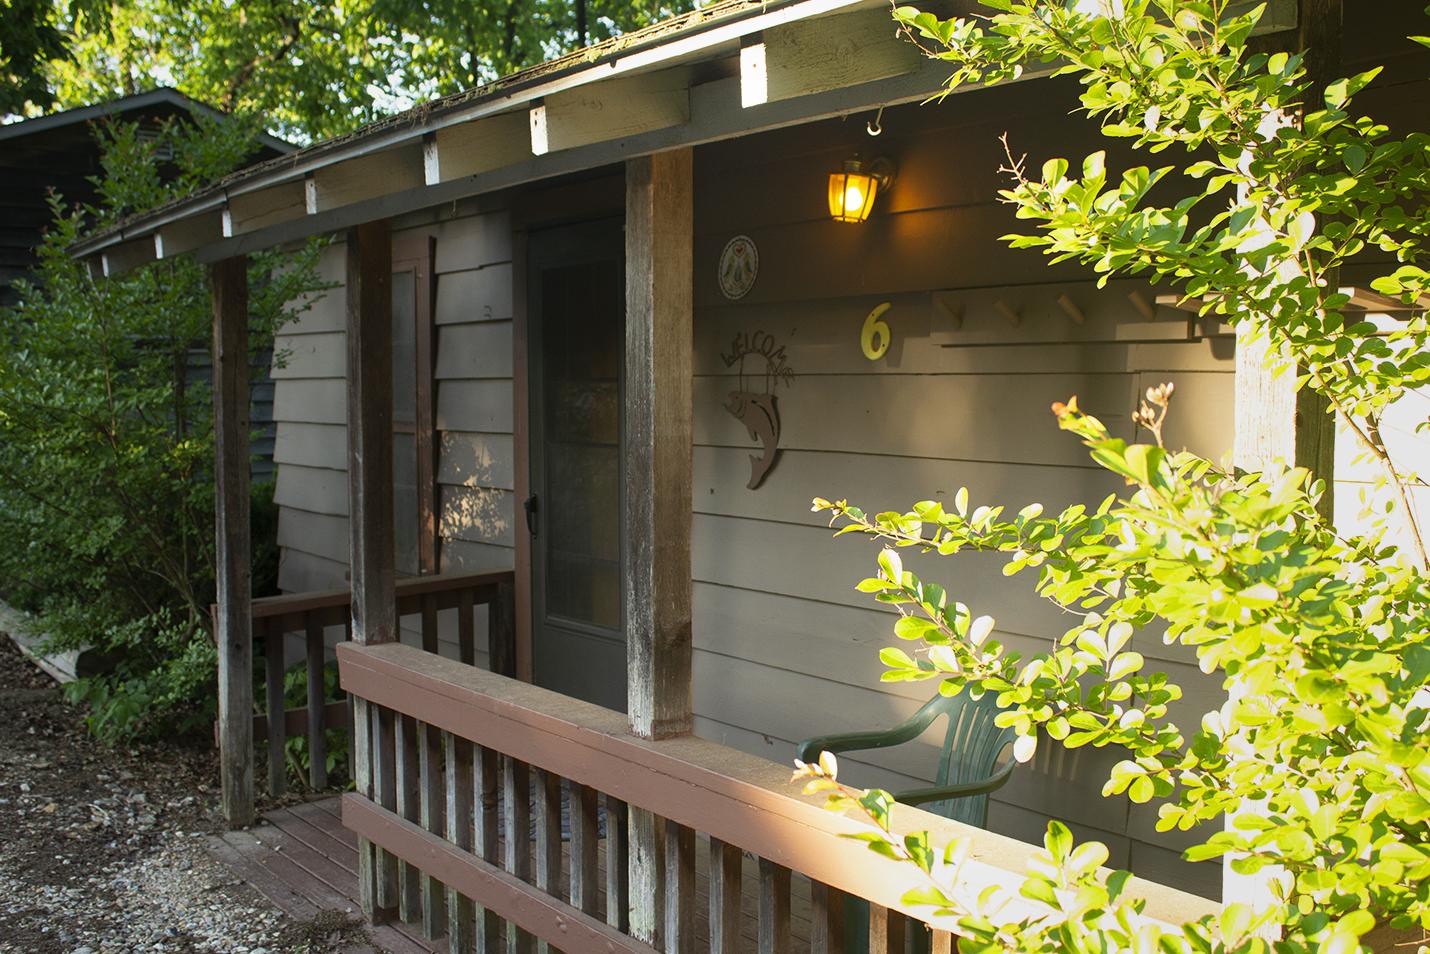 Cabin 6 front.jpg